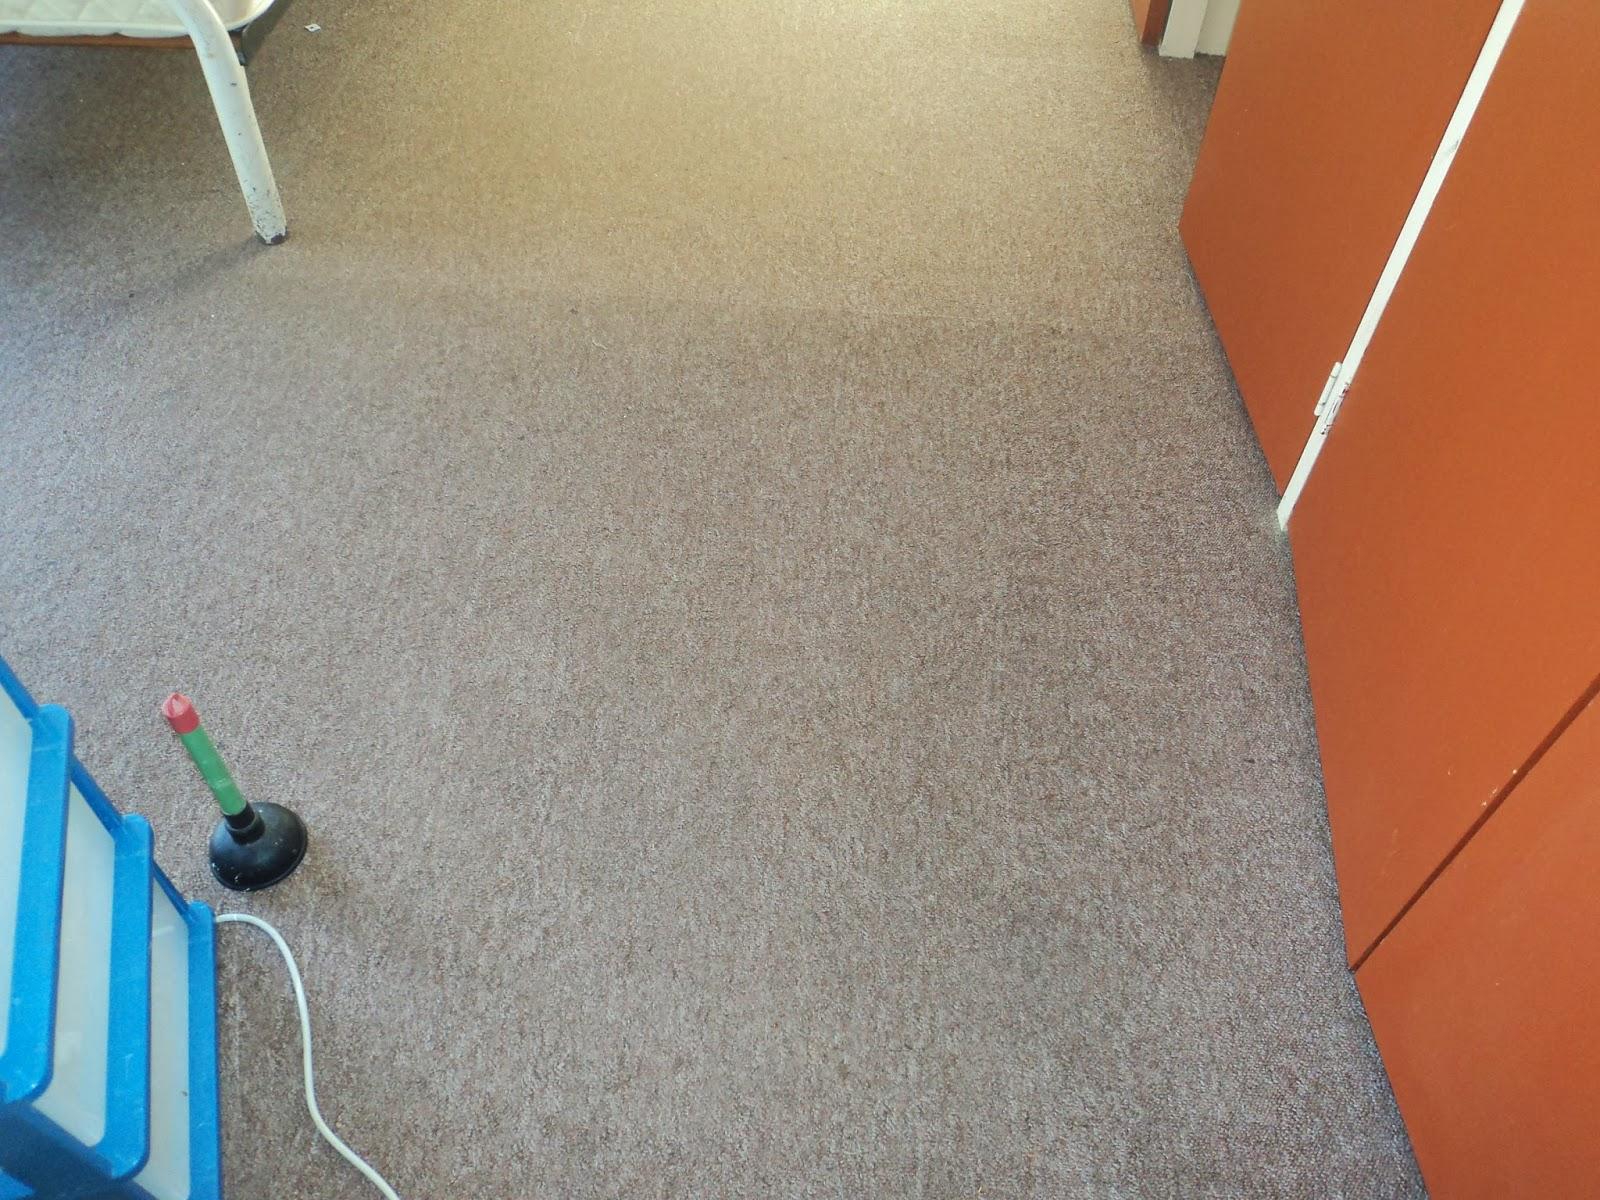 Diamond Carpet Cleaning News